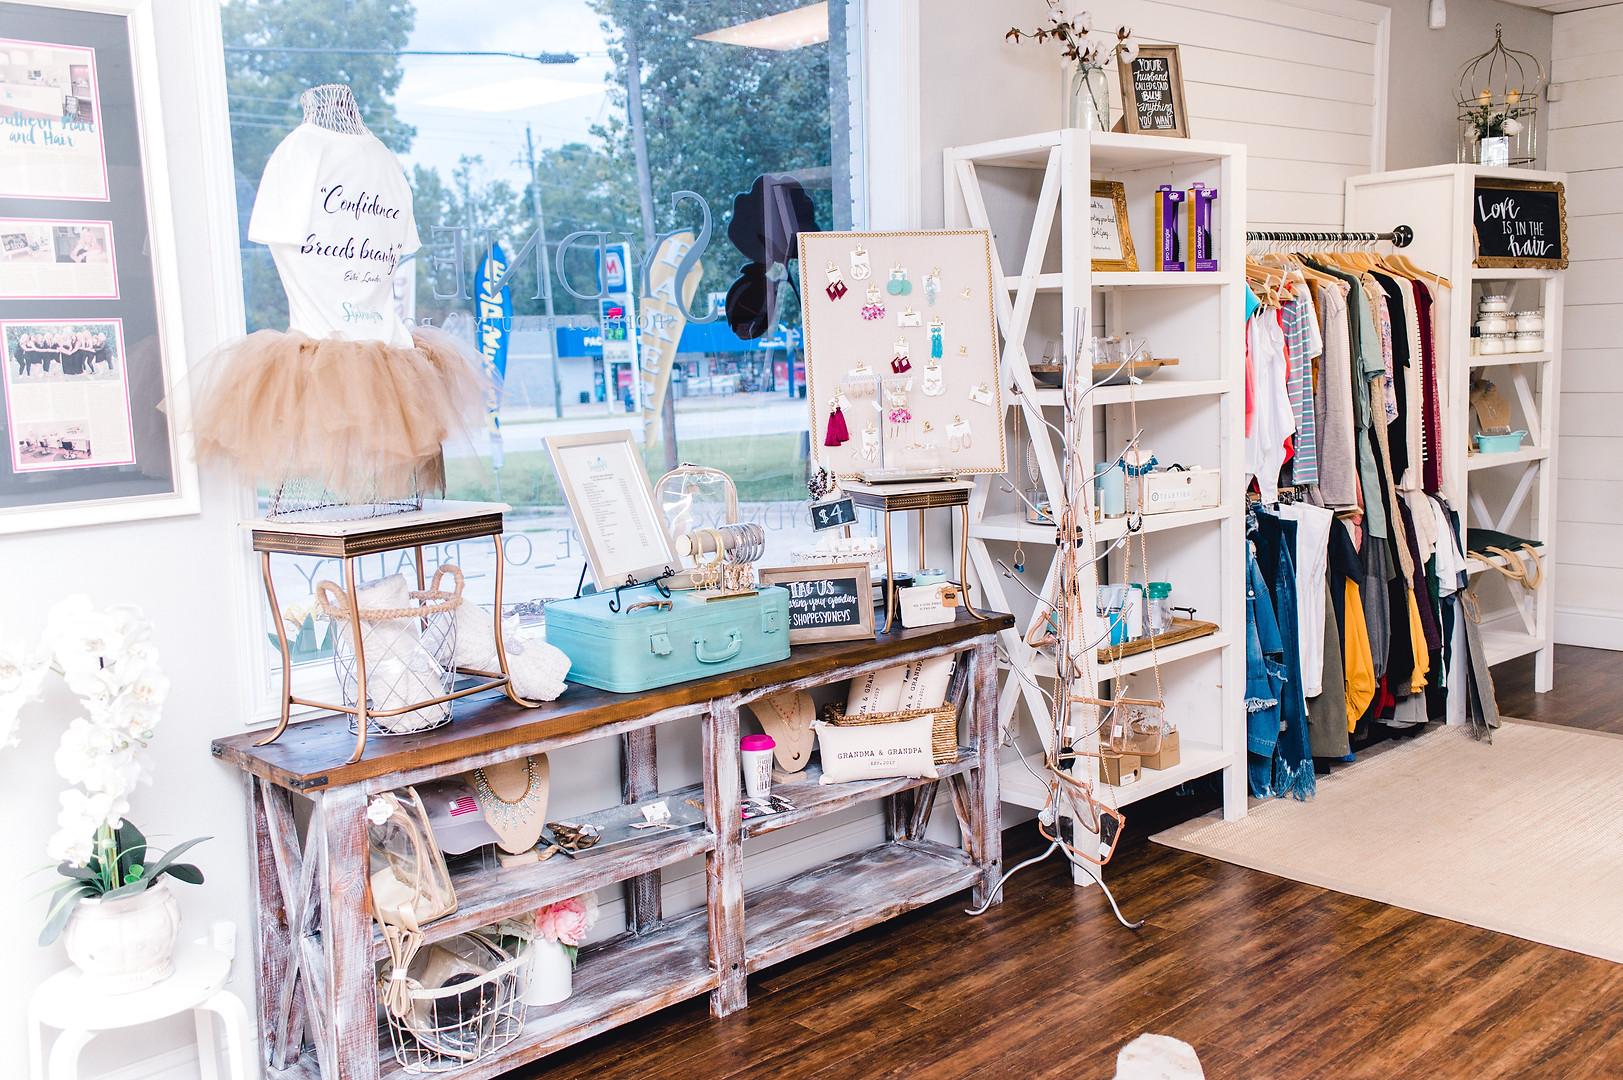 Sydney's Shoppe of Beauty & Boutique